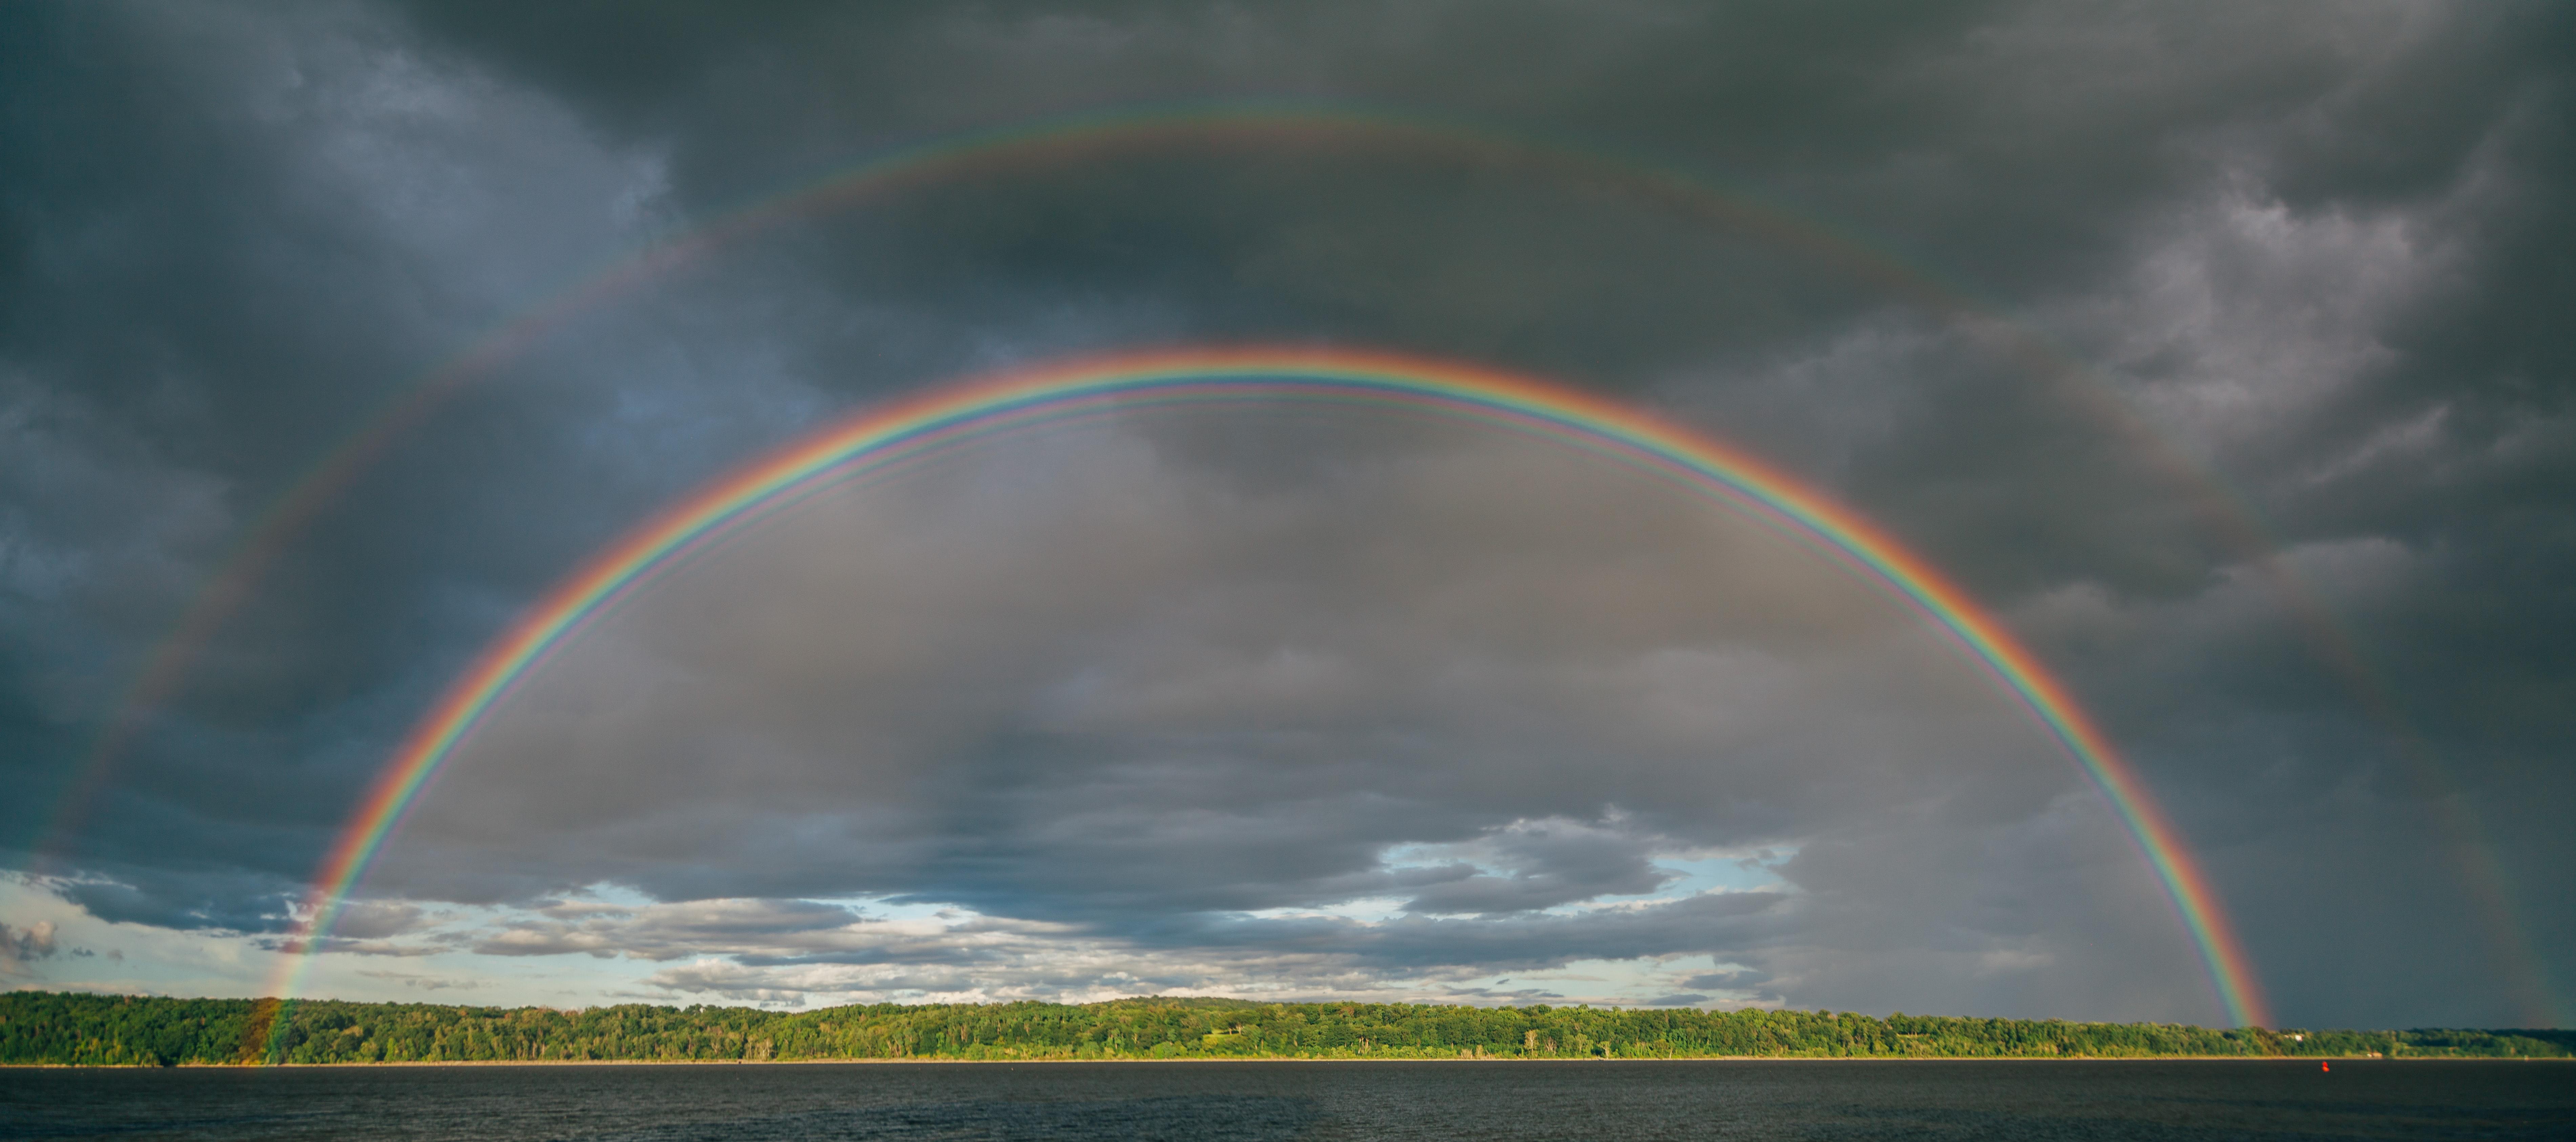 Photo of rainbow in the sky